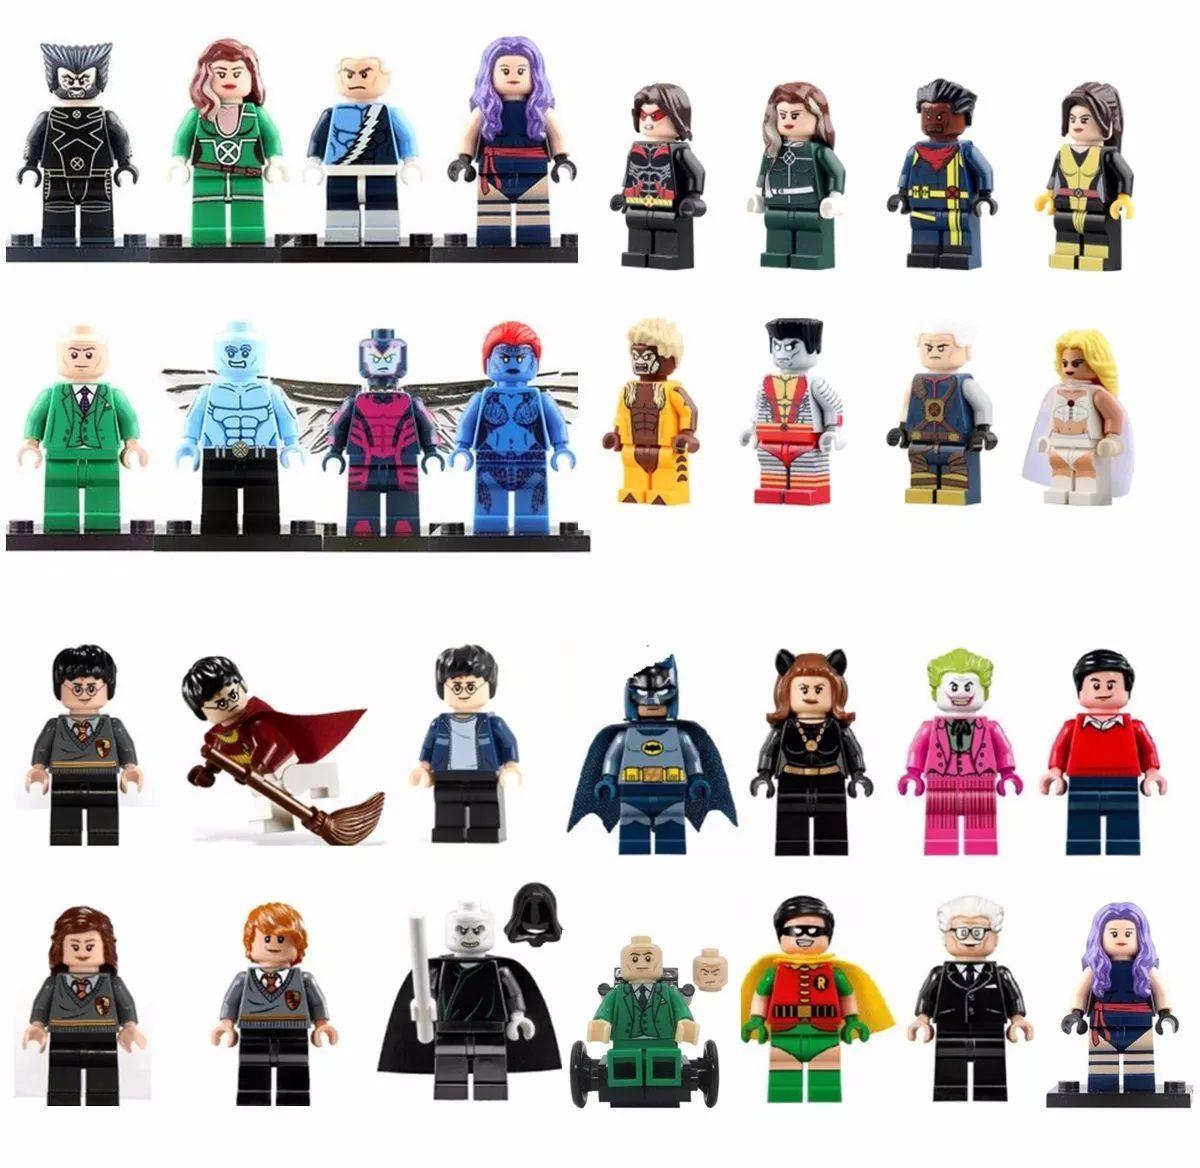 Lego batman bonecos compativeis playmobil marvel r 5 - Batman playmobil ...